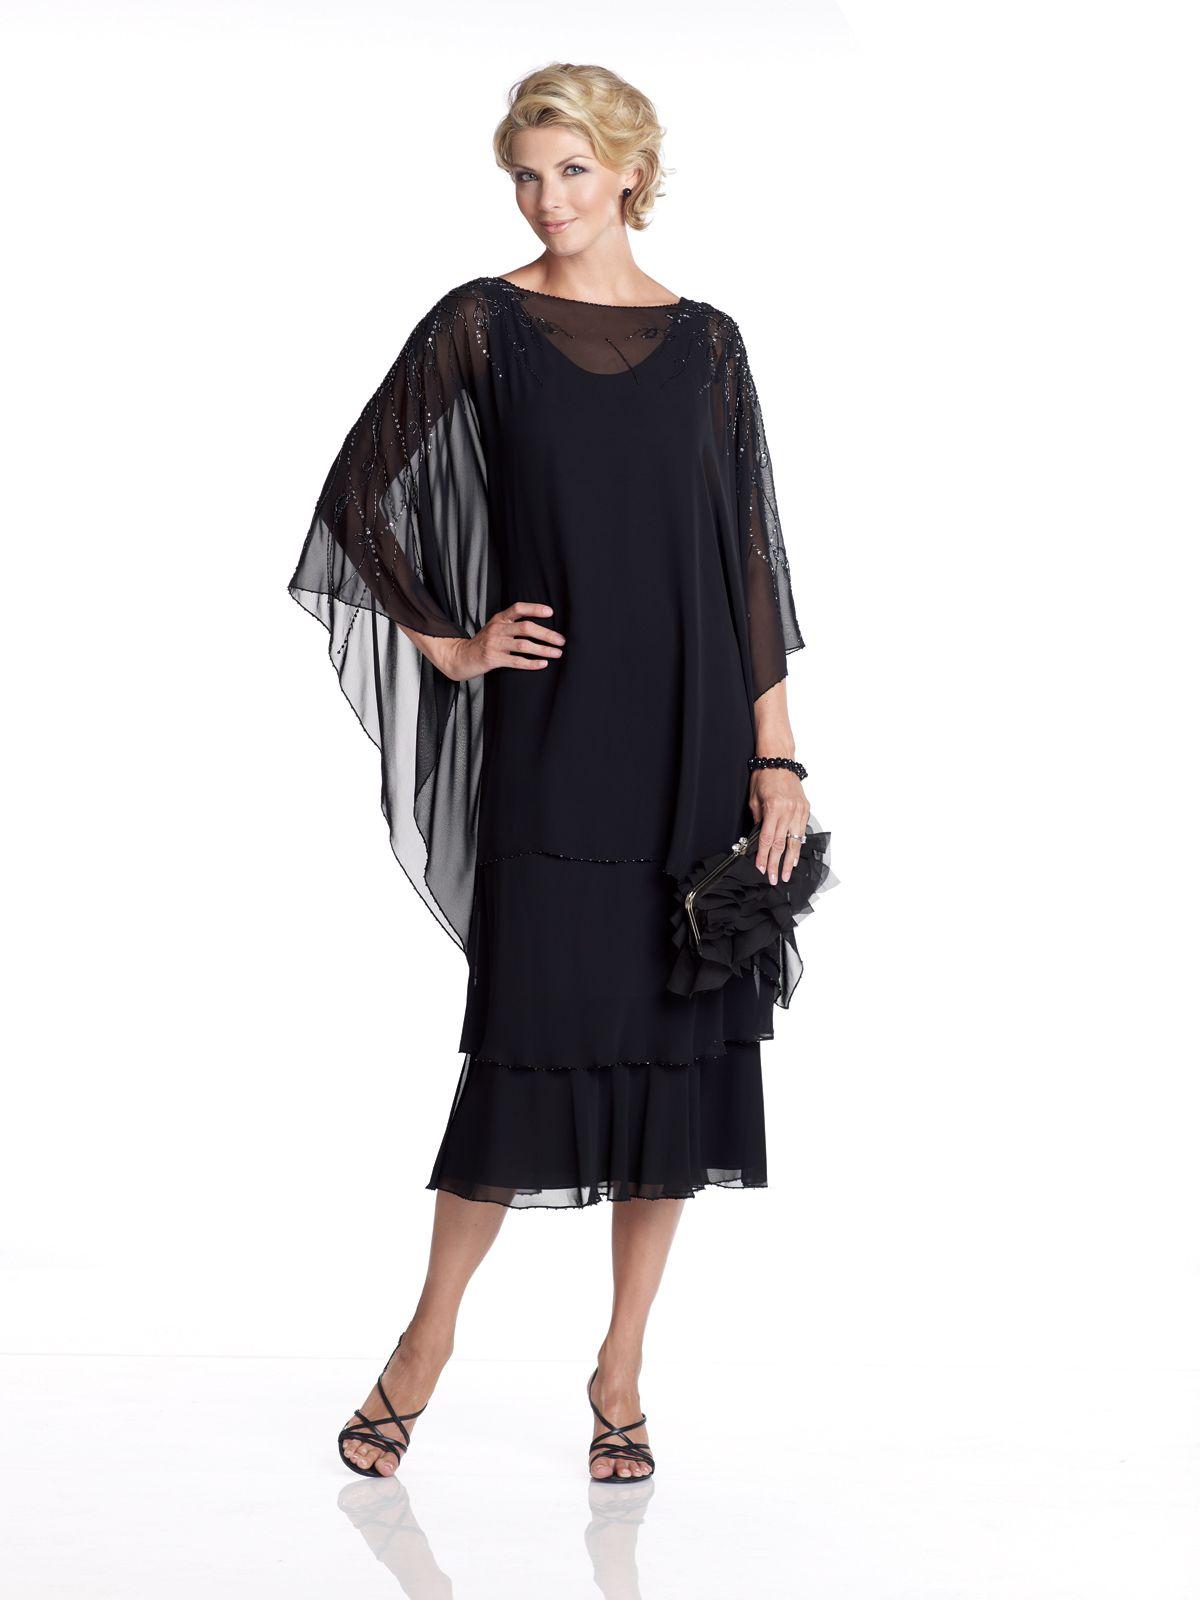 Style no uacpdescription uatwopiece chiffon dress set